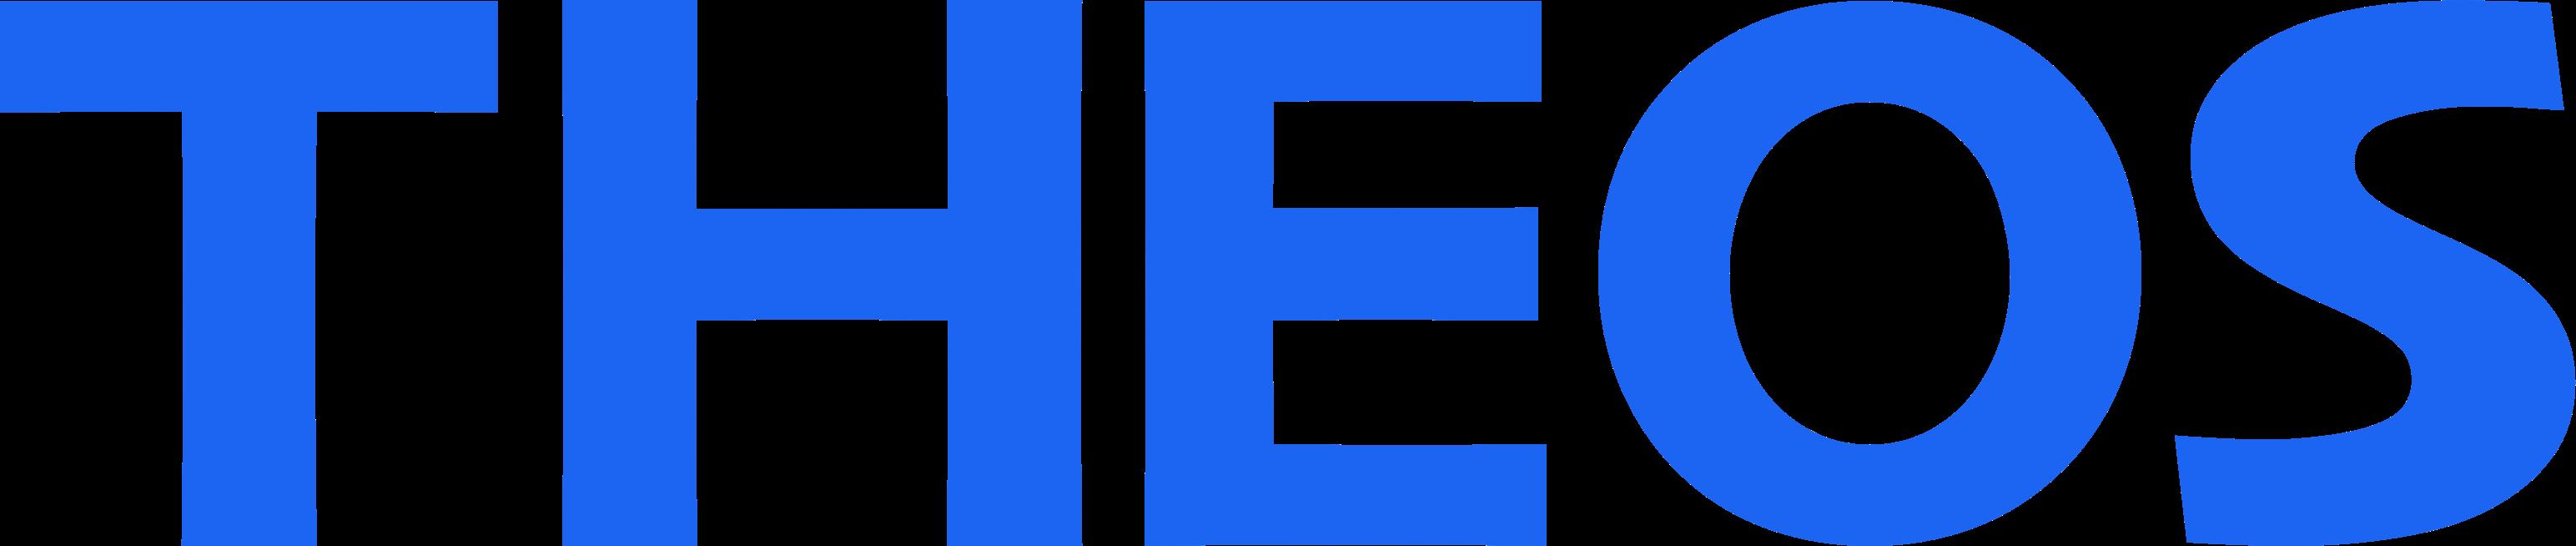 logo-b6078746d7b62f4e4f822160d35878f7